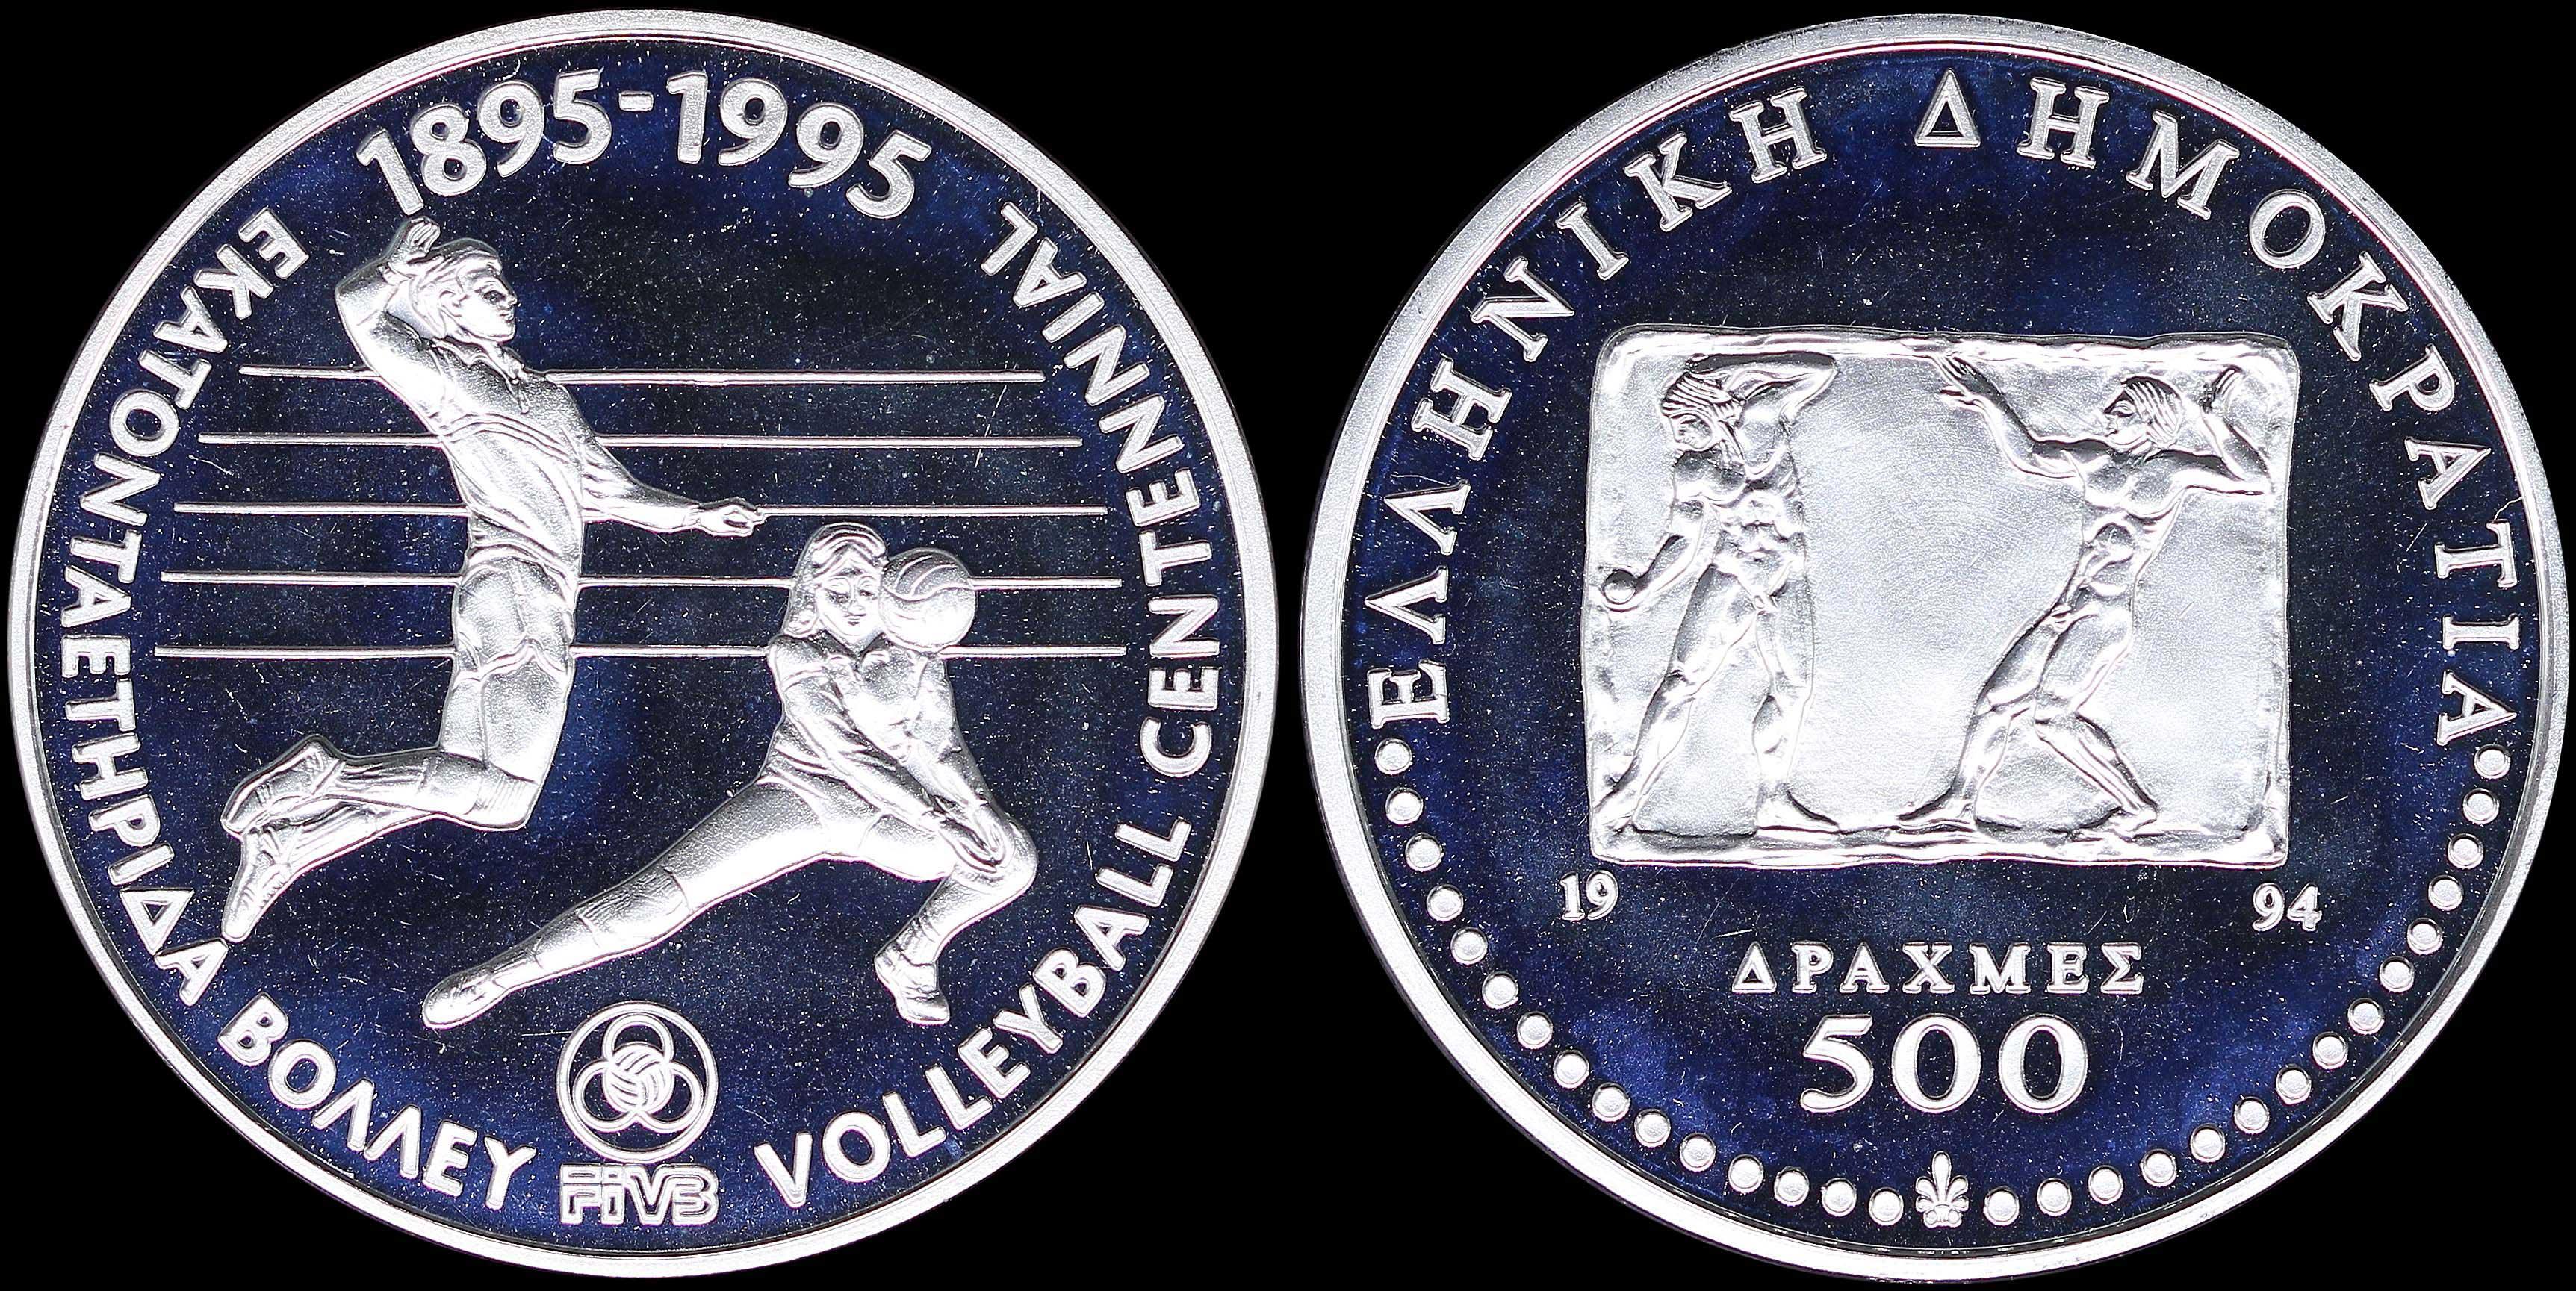 Lot 6231 - -  COINS & TOKENS HELLENIC REPUBLIC & COMMEMORATIVE ISSUES -  A. Karamitsos Public & Live Internet Auction 682 (Part A) Coins, Medals & Banknotes